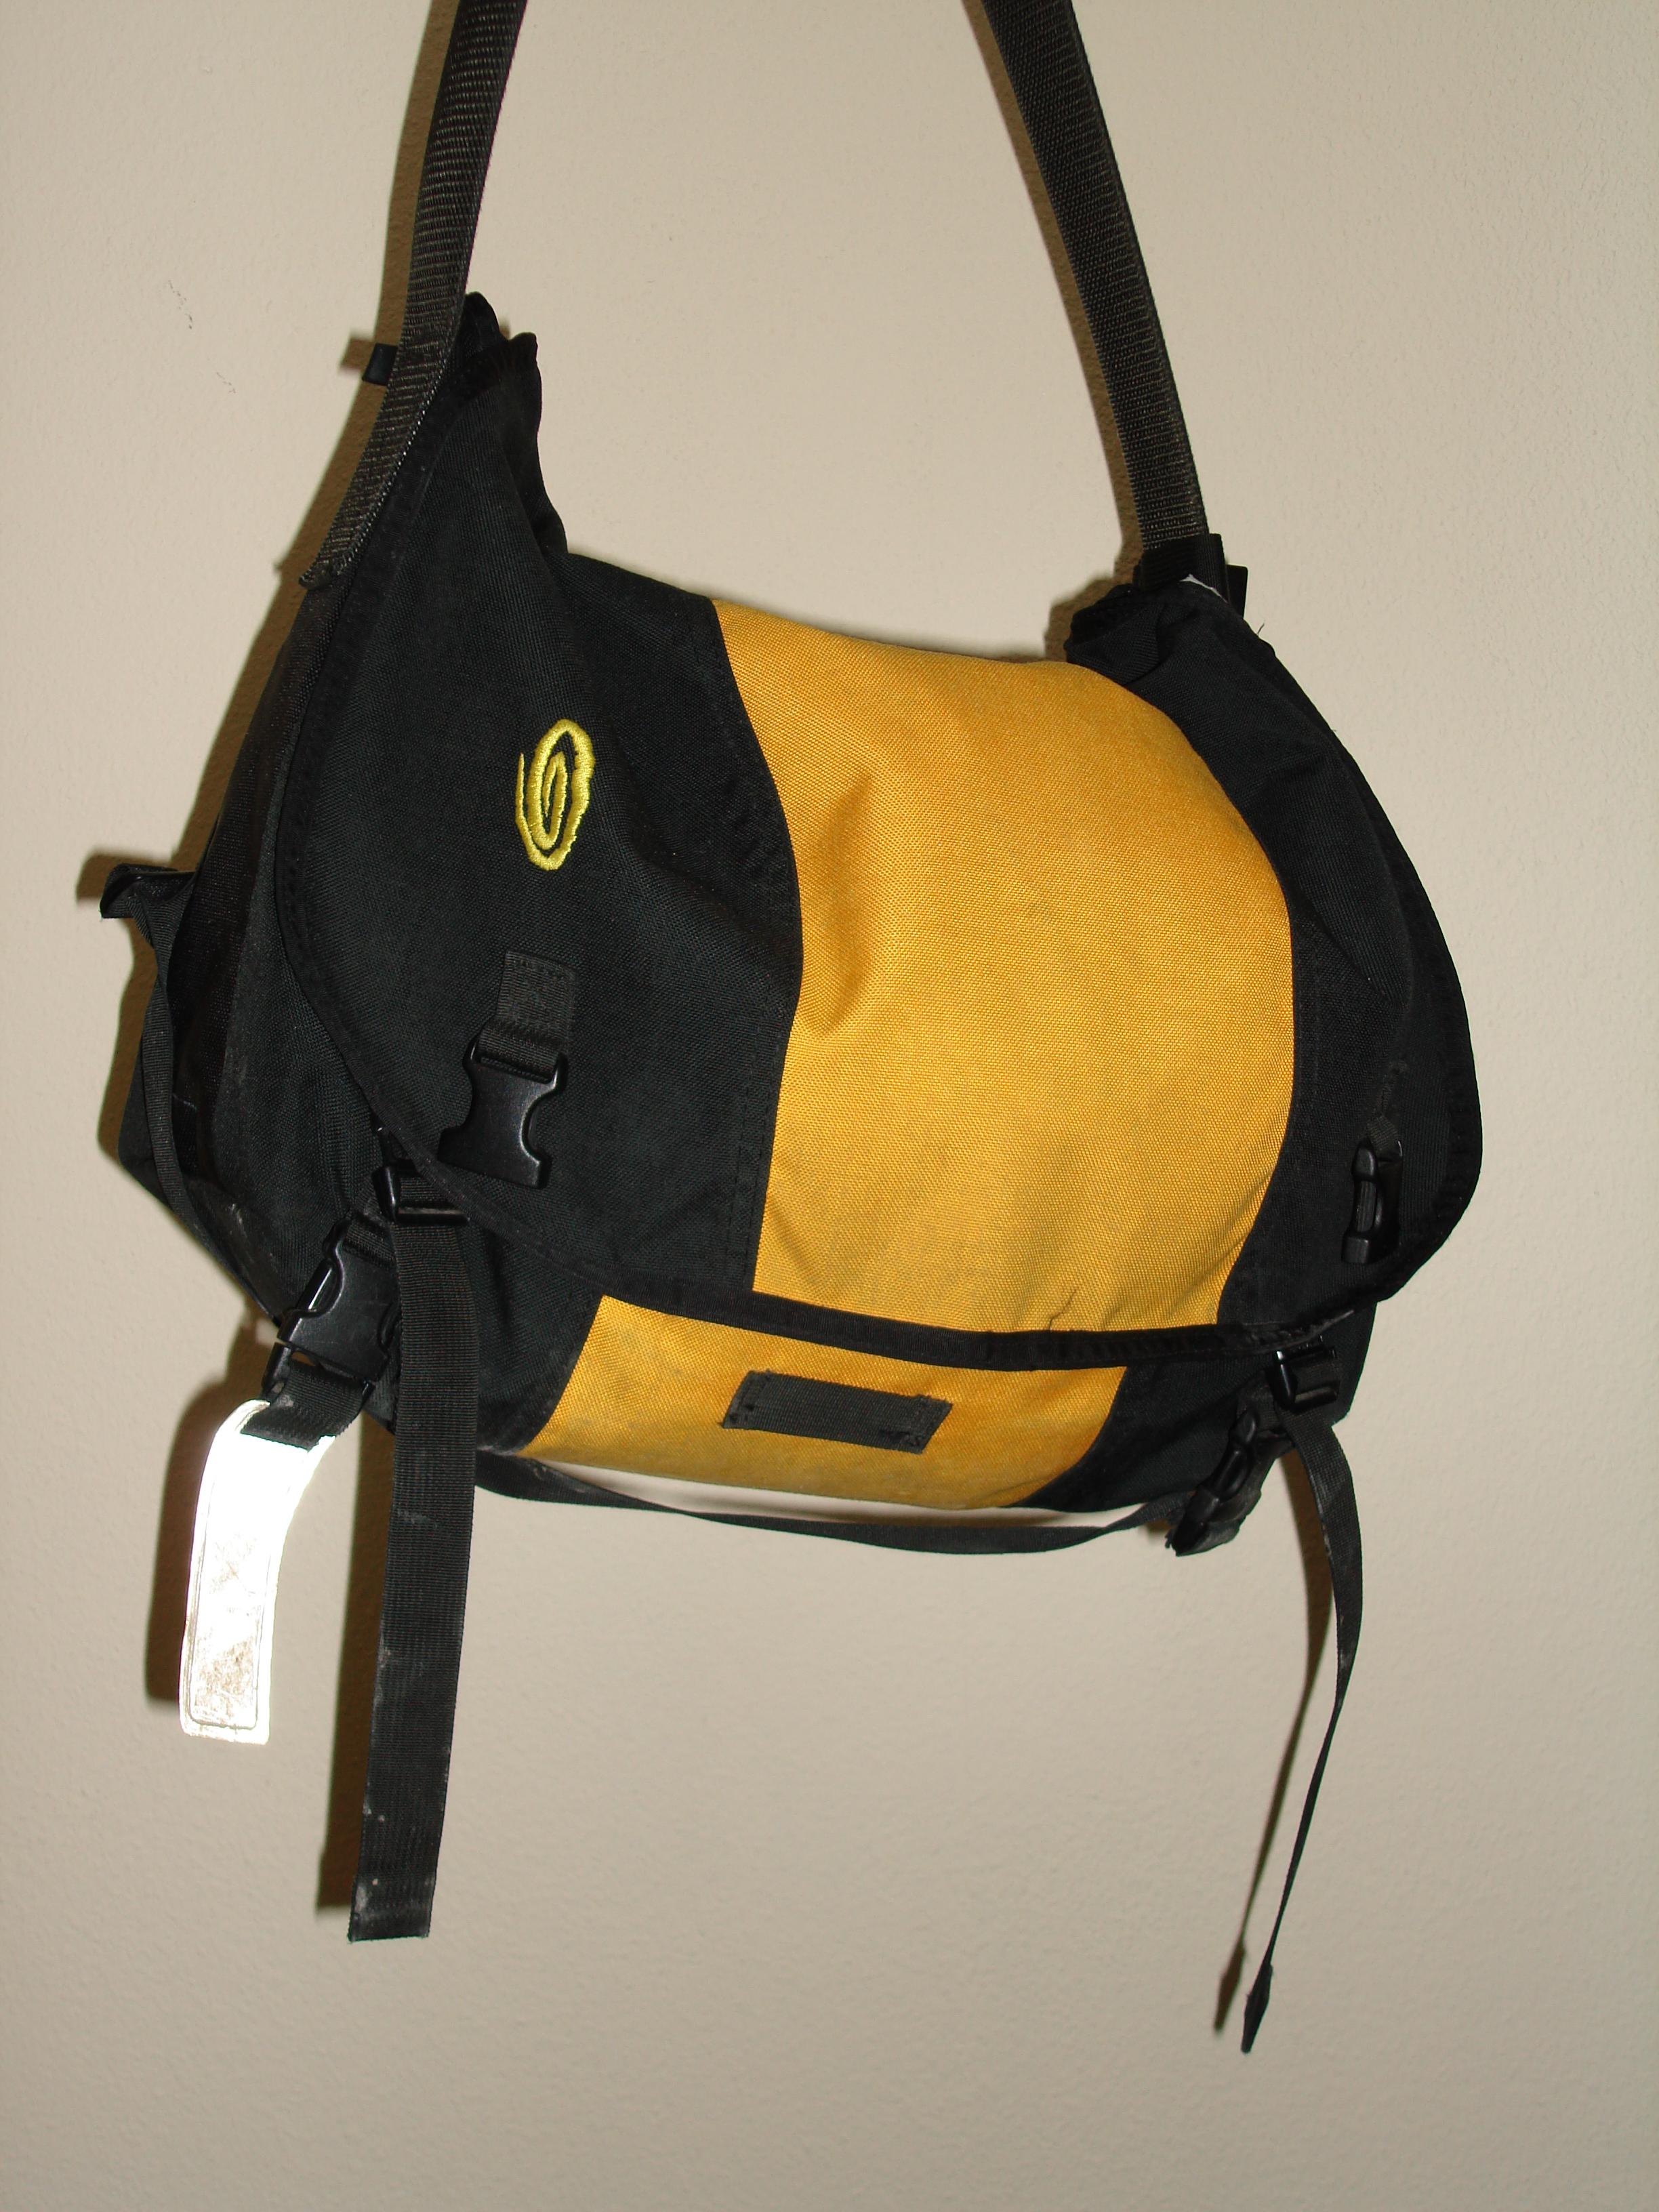 Filetimbuk2 Custom Made Messenger Bag Deedog Wikimedia Commons Tas Kamera Wotancraft